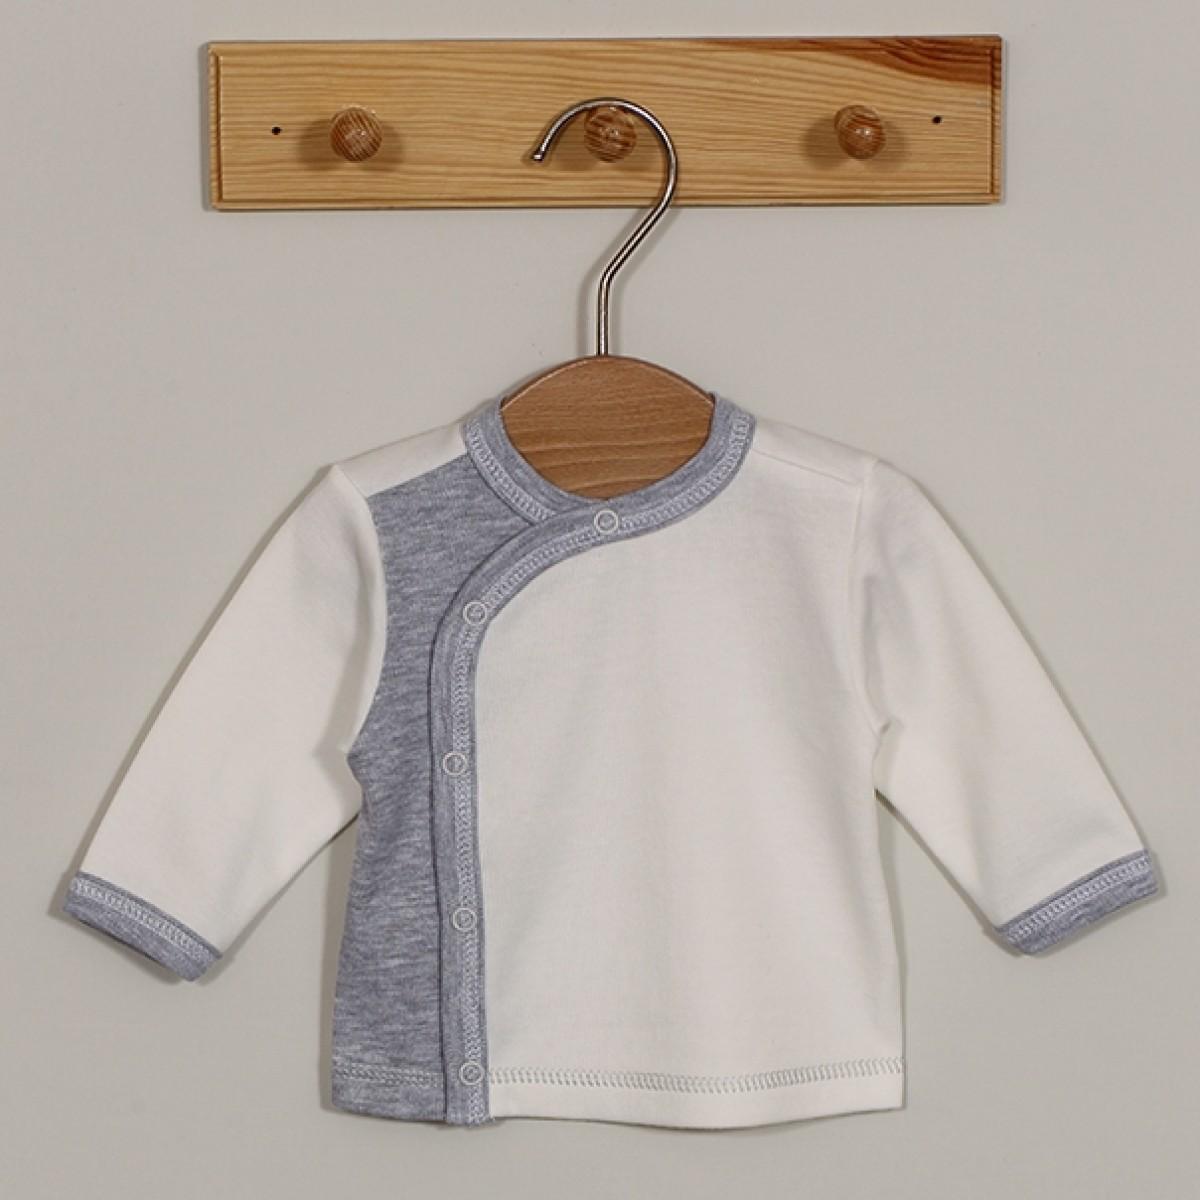 Marškinėliai VILAURITA Piccolo, 56 cm (126)